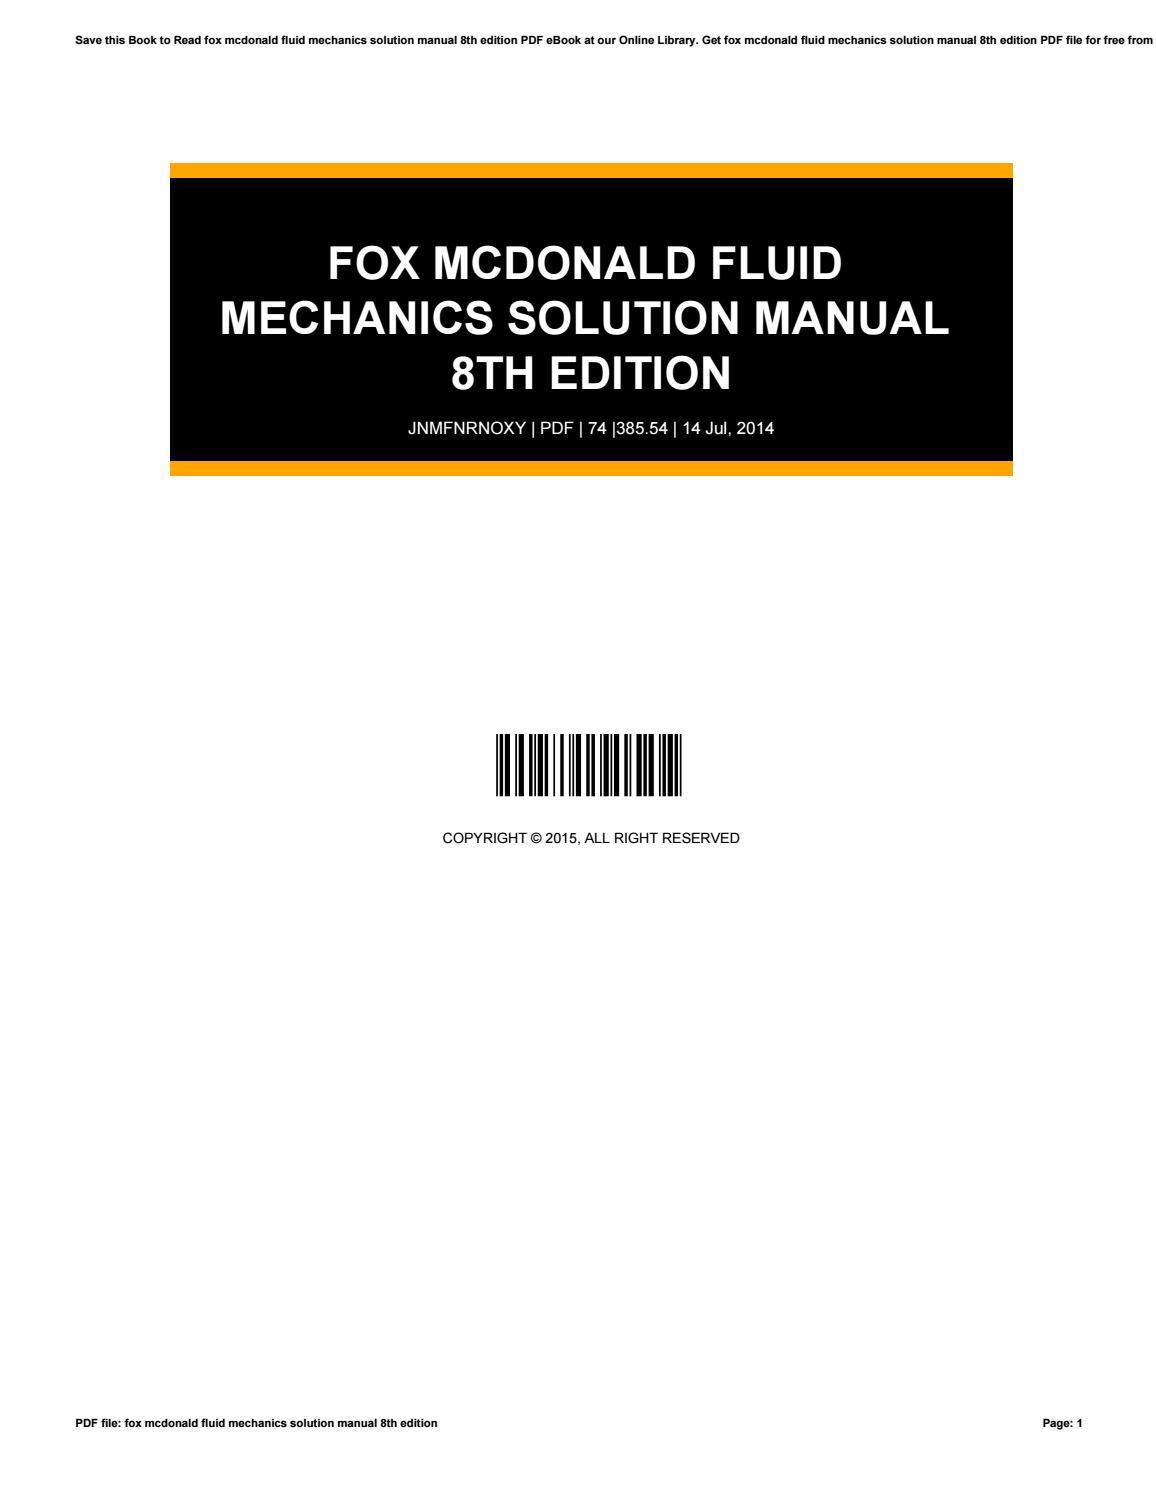 Fox mcdonald fluid mechanics solution manual 8th edition by drivetagdev525  - issuu